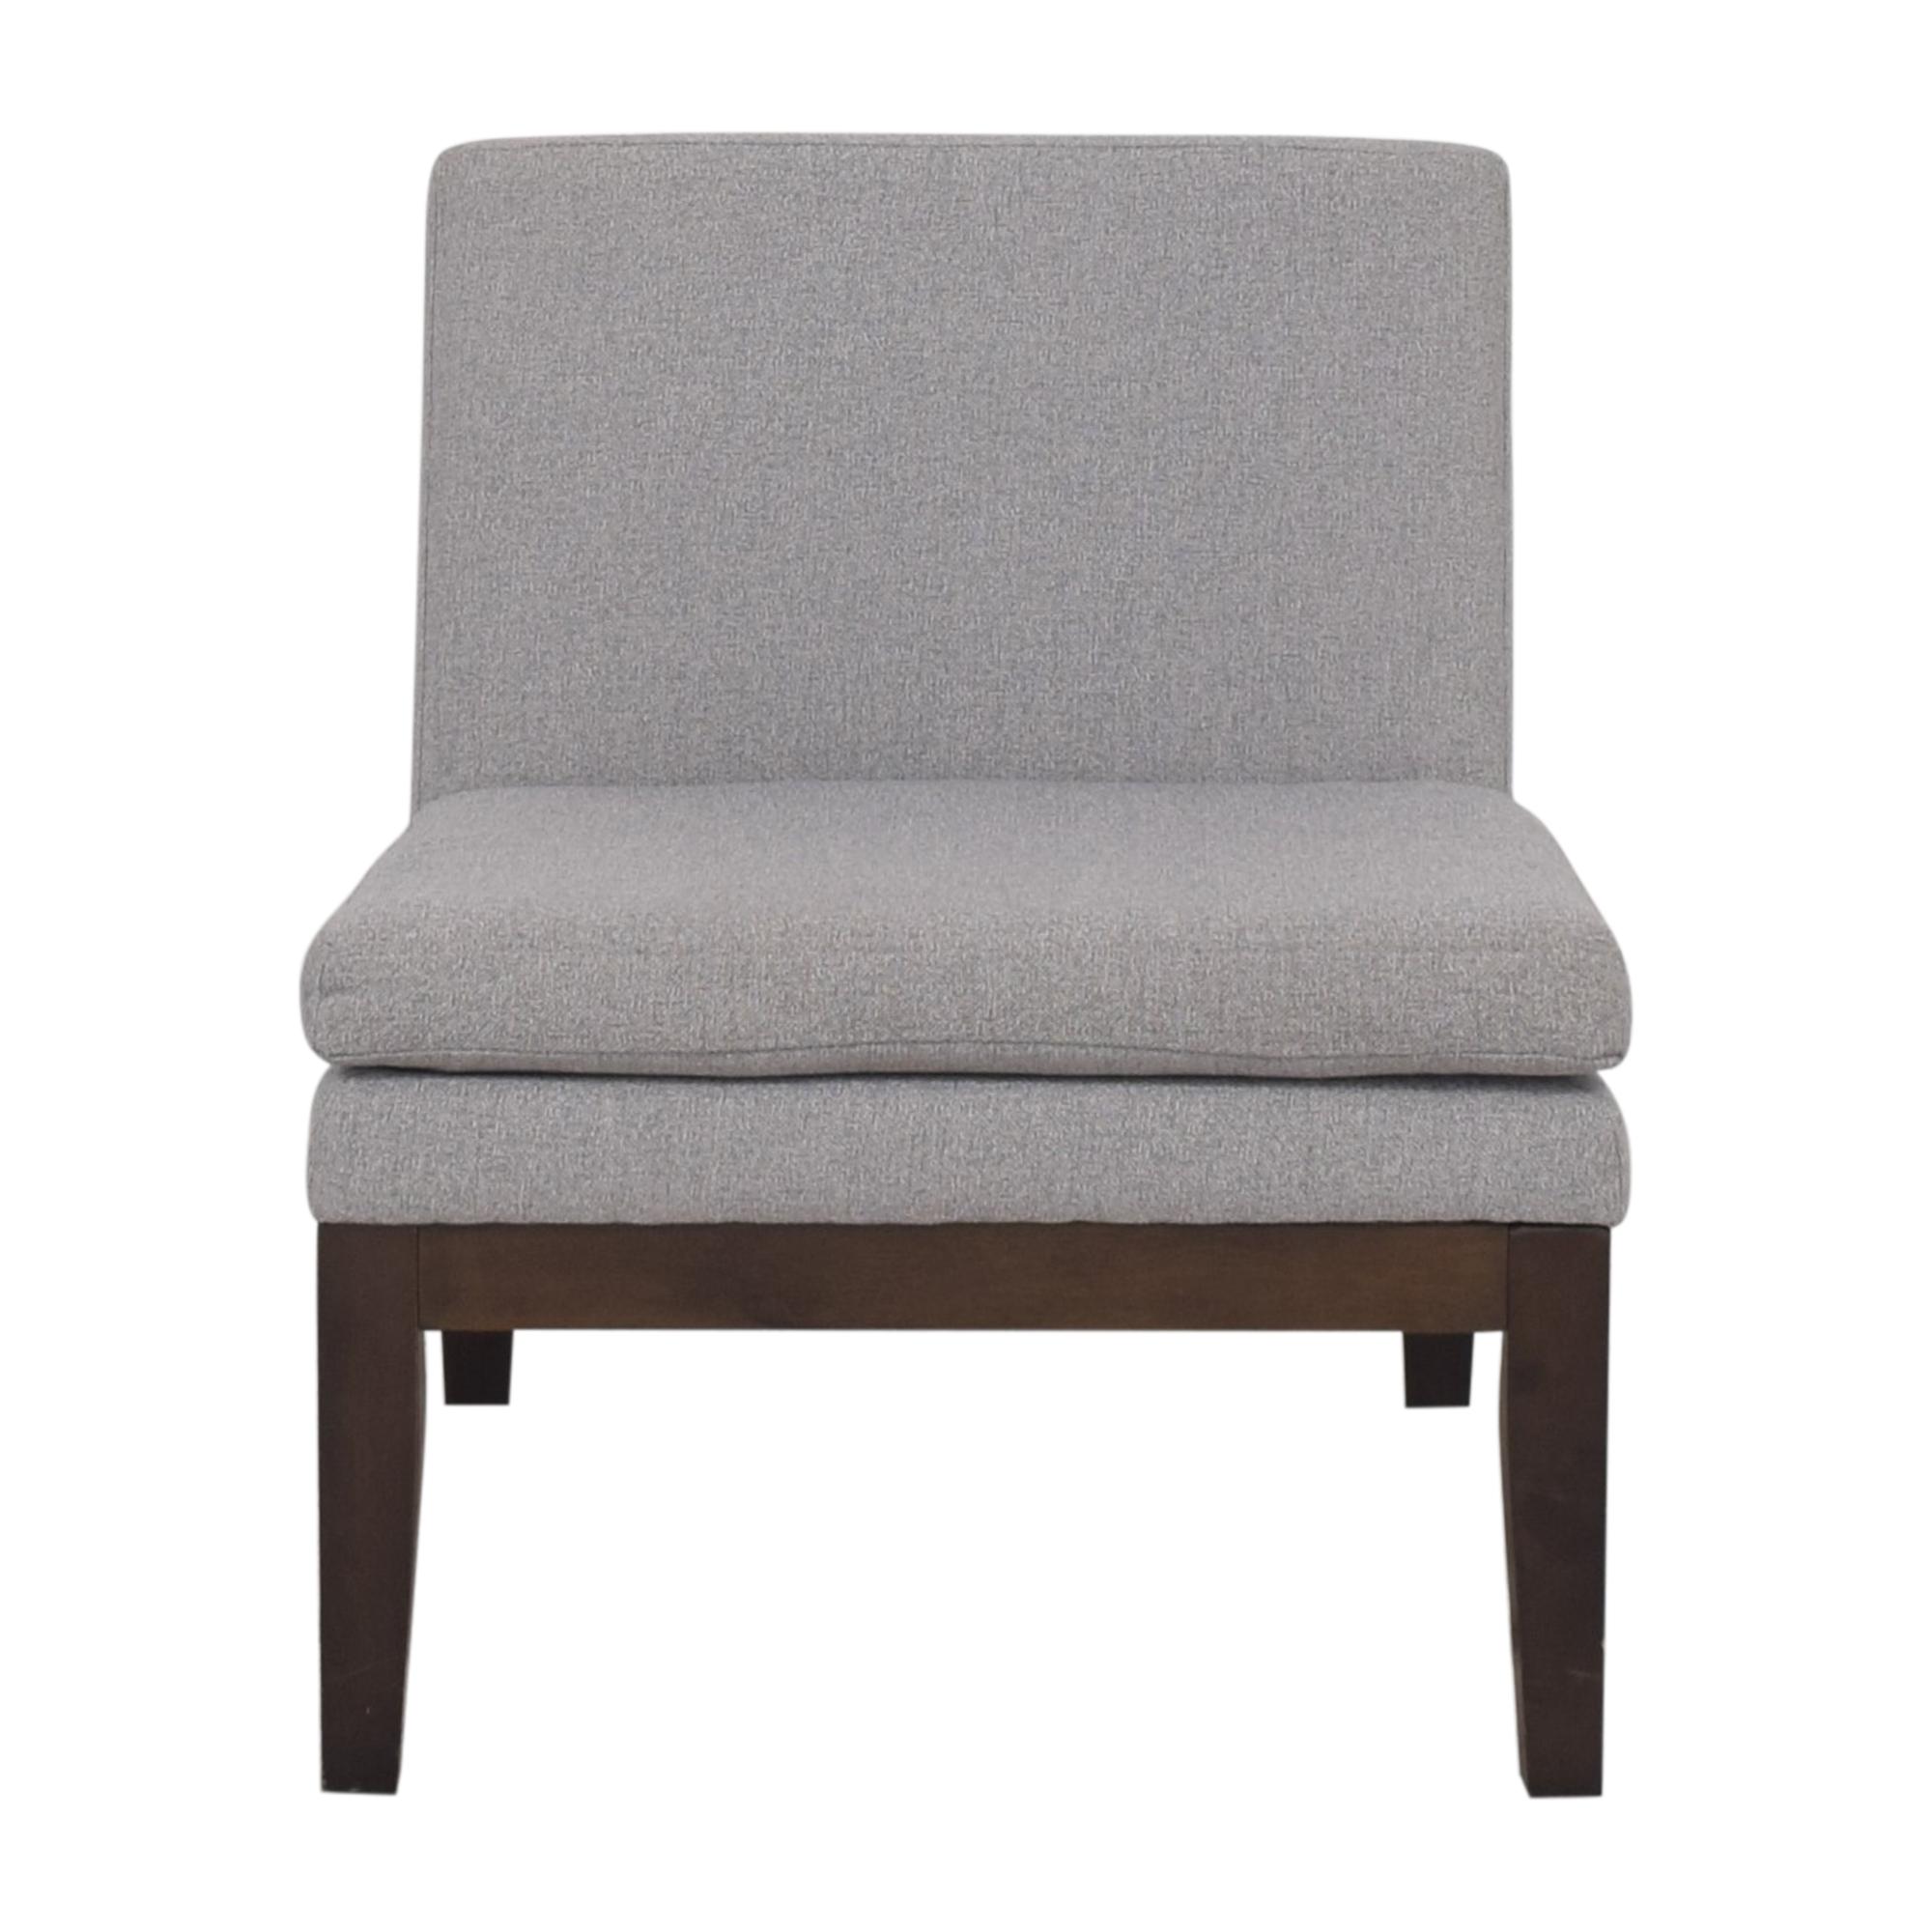 West Elm West Elm Slipper Chair second hand